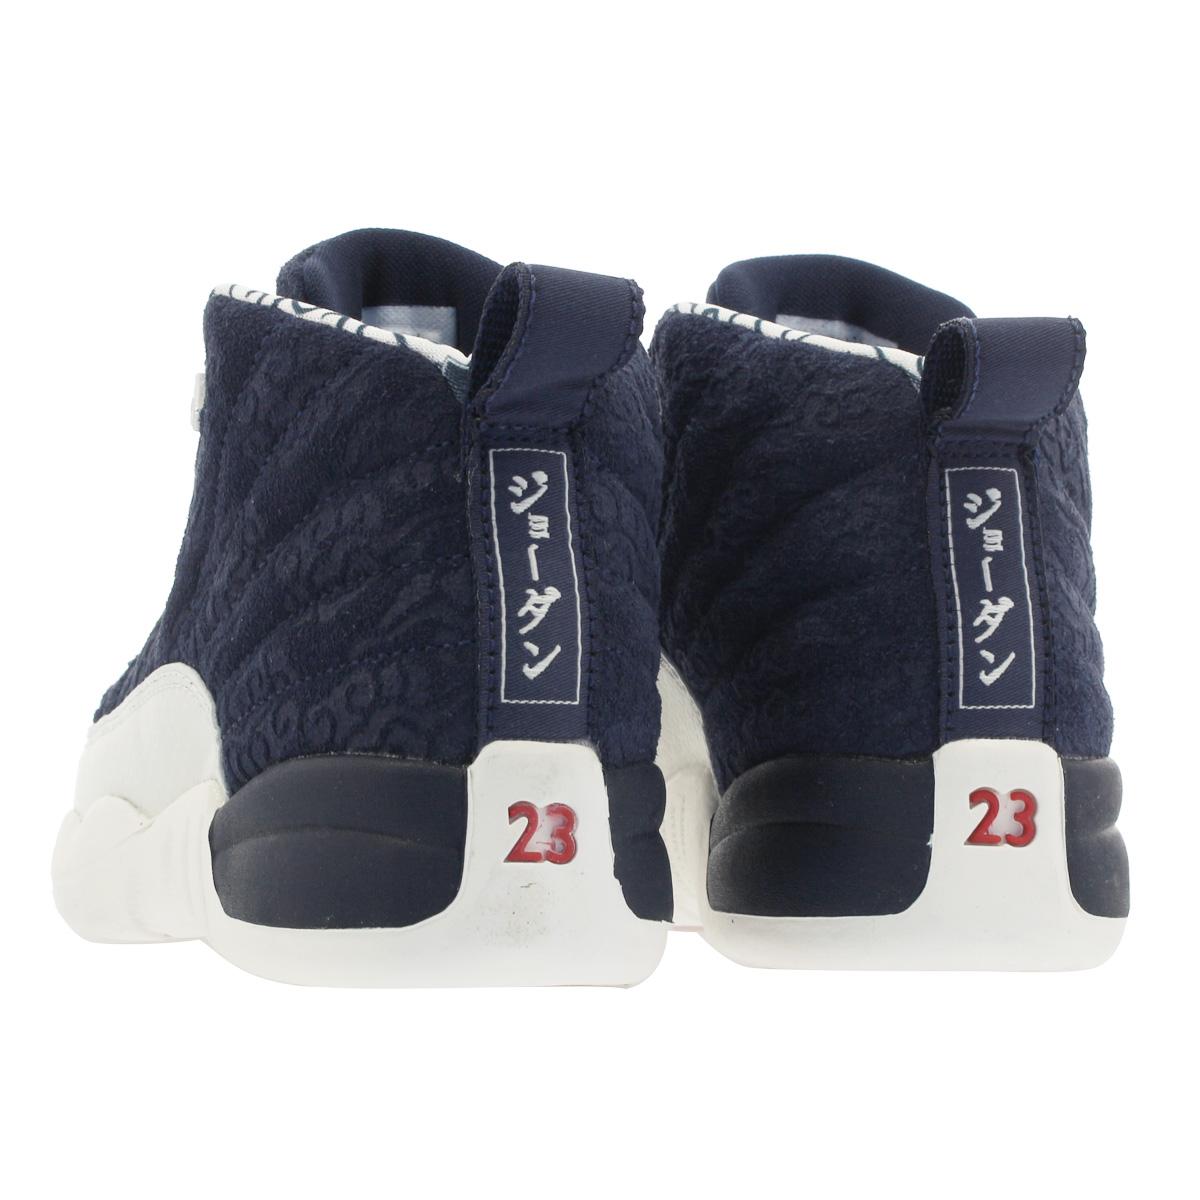 0e5595a10698 NIKE AIR JORDAN 12 RETRO PS Nike Air Jordan 12 nostalgic PS COLLEGE NAVY SAIL UNIVERSITY  RED bv8018-445